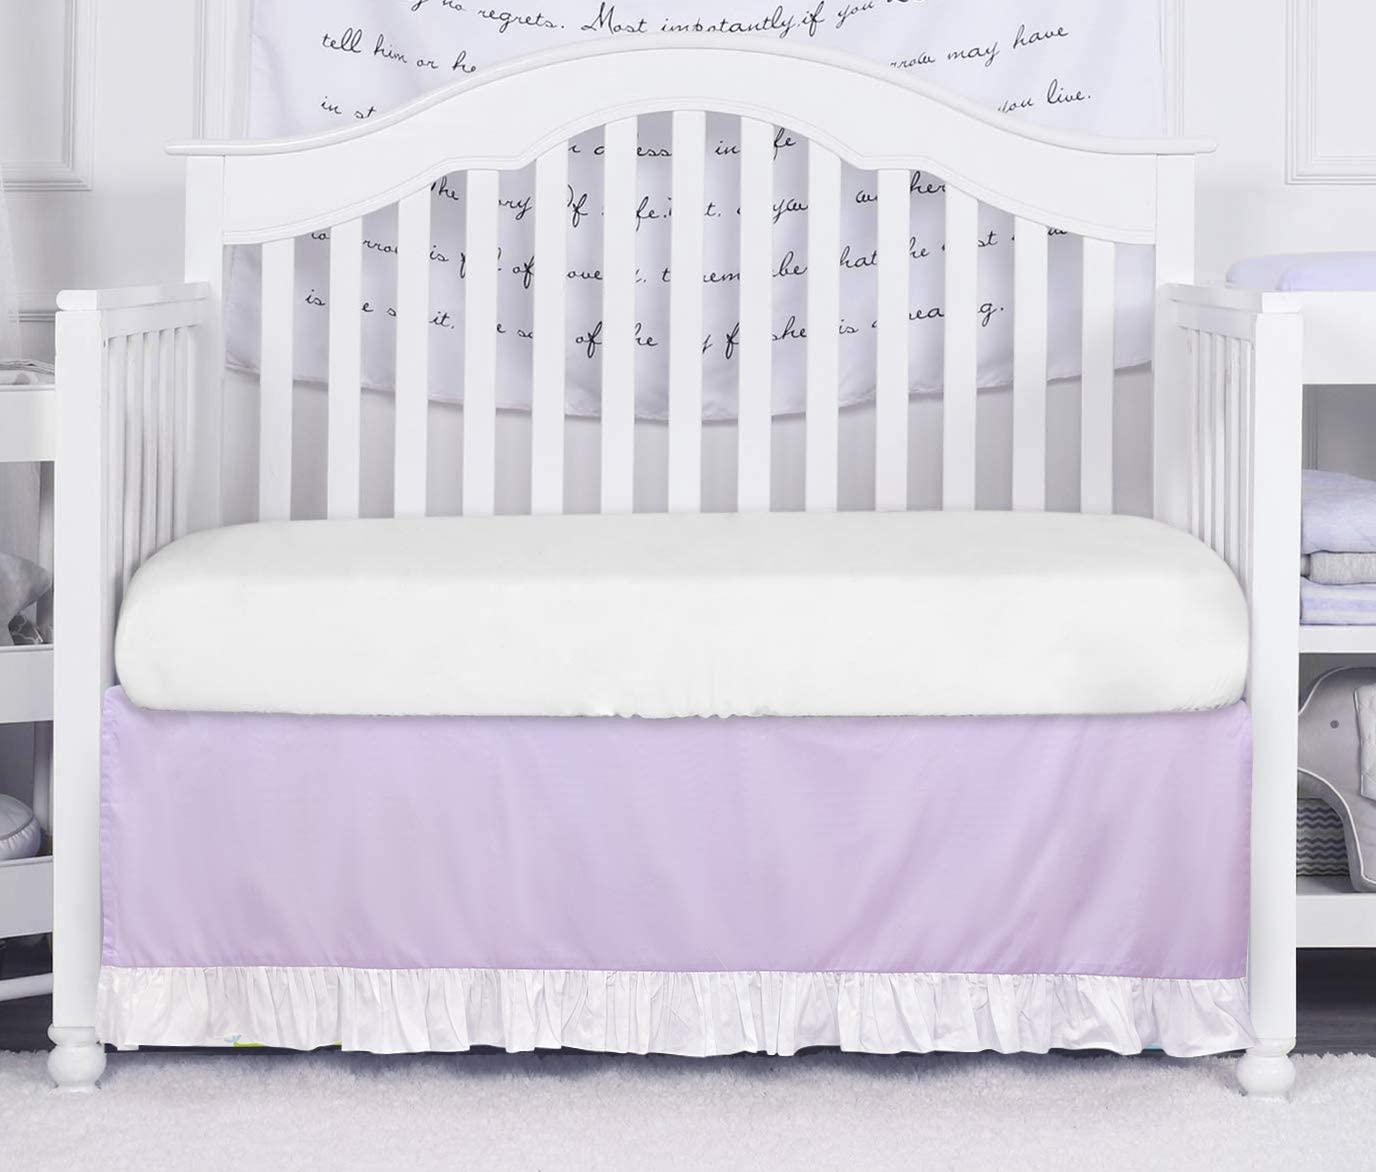 Brandream Baby Girls Crib Skirt Purple Dust Ruffle Nursery Bed Skirt for Newborn Infant Baby Bedding, 100% Natural Cotton Luxury Princess Cradle Bedding Crib Skirt with White Ruffle 16 inch Drop